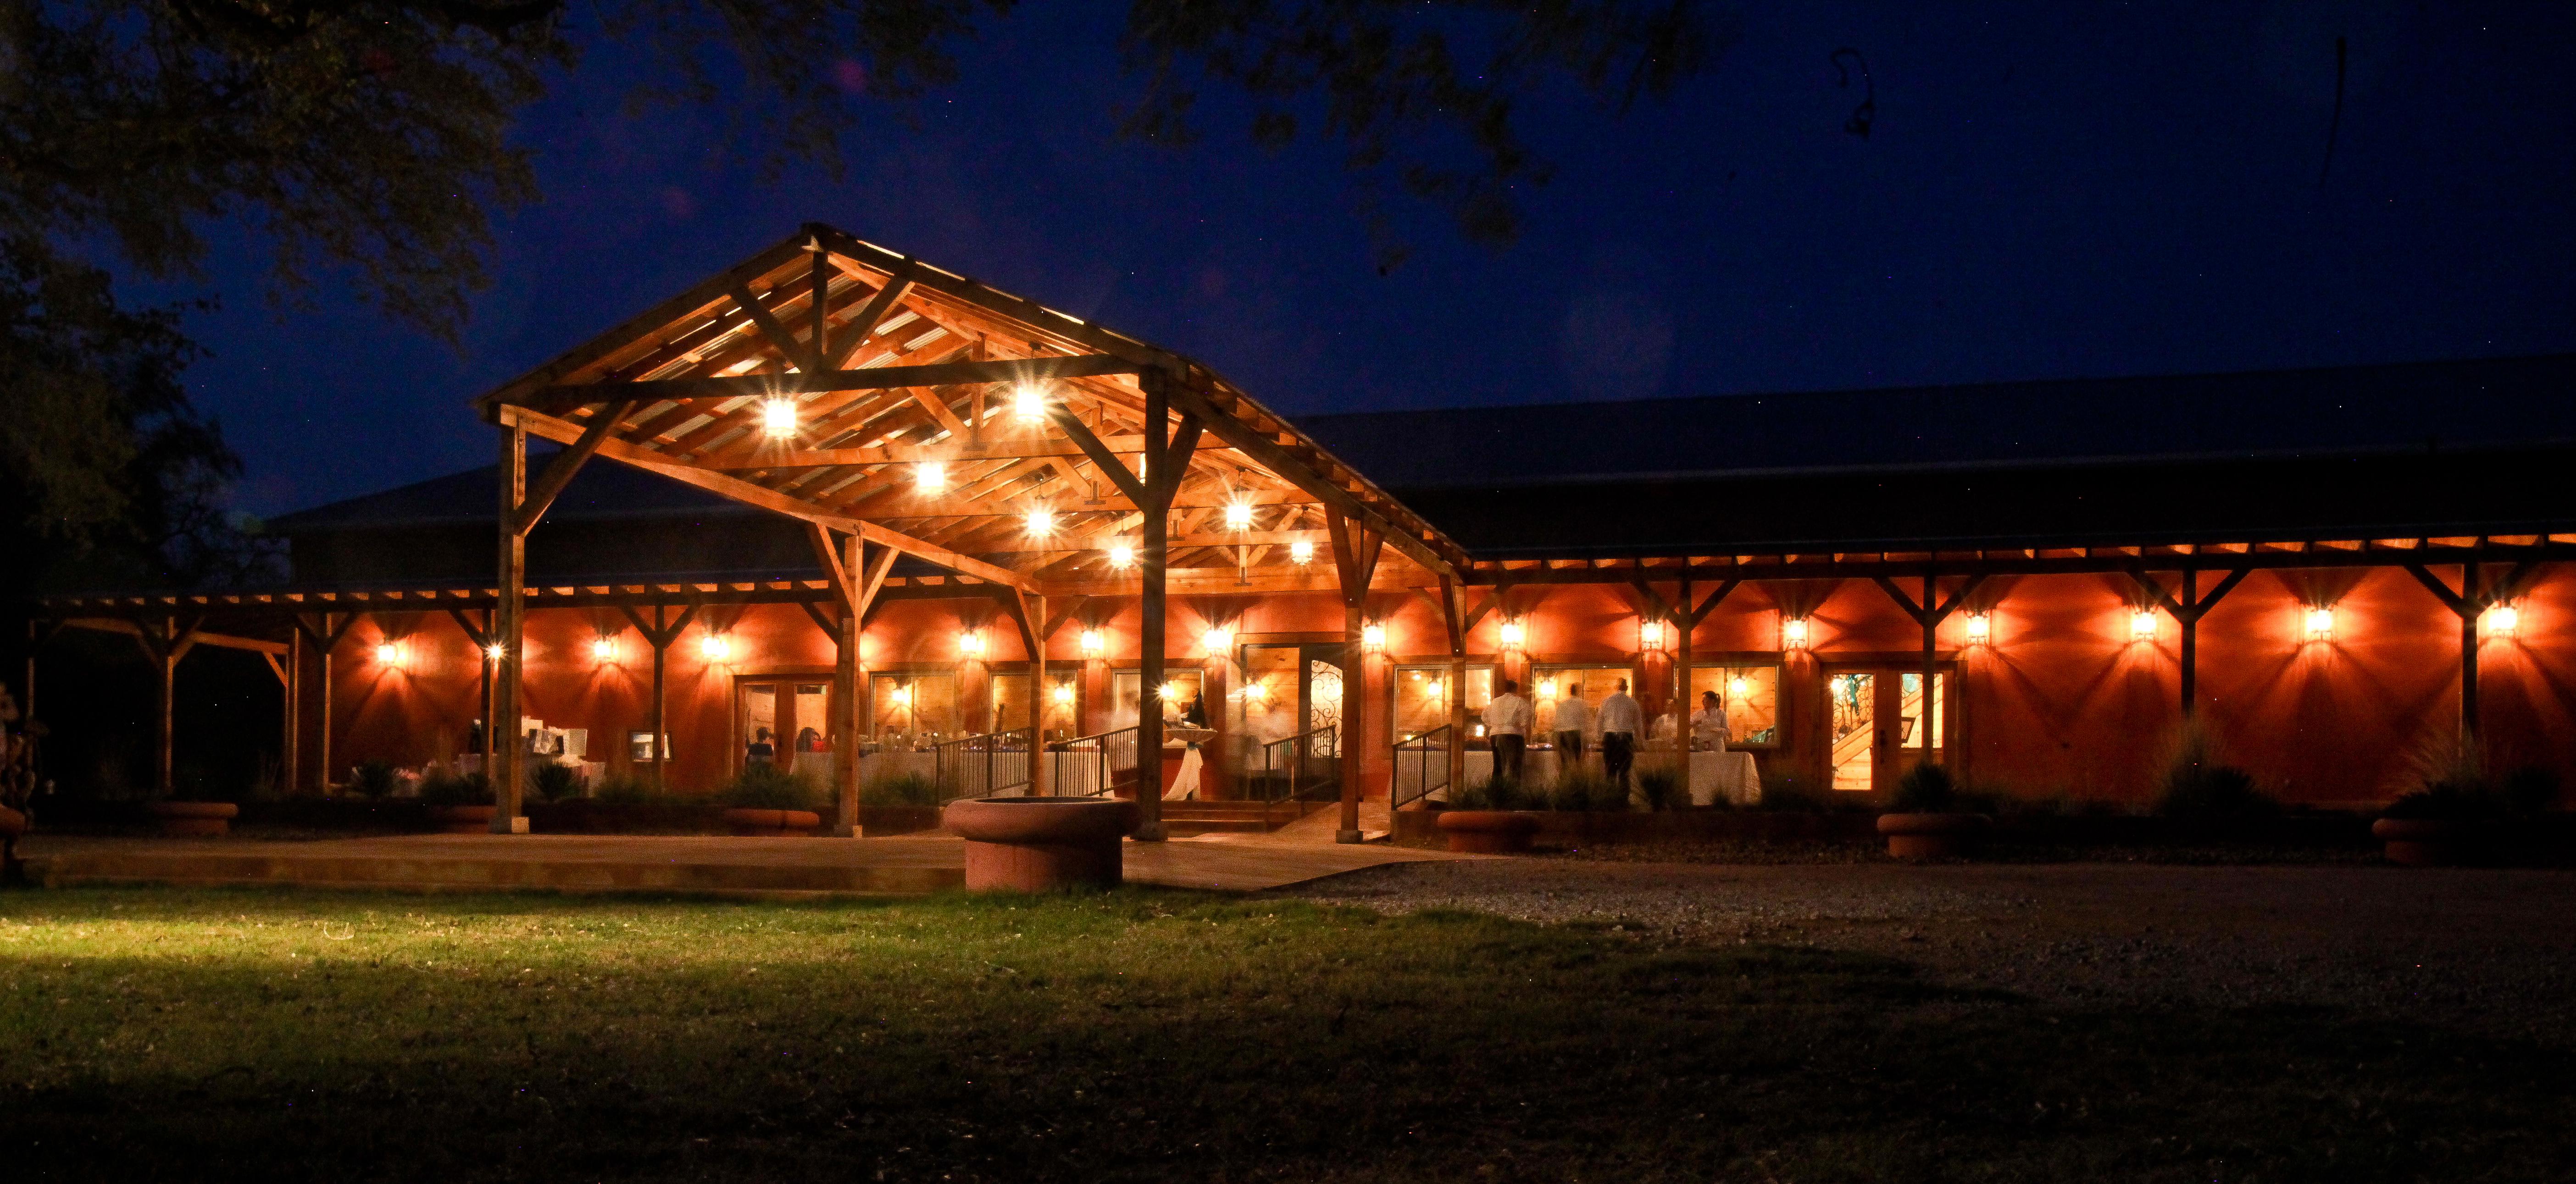 Sandy Oaks Ranch Weddings Events Wing Shooting 210-394-4857